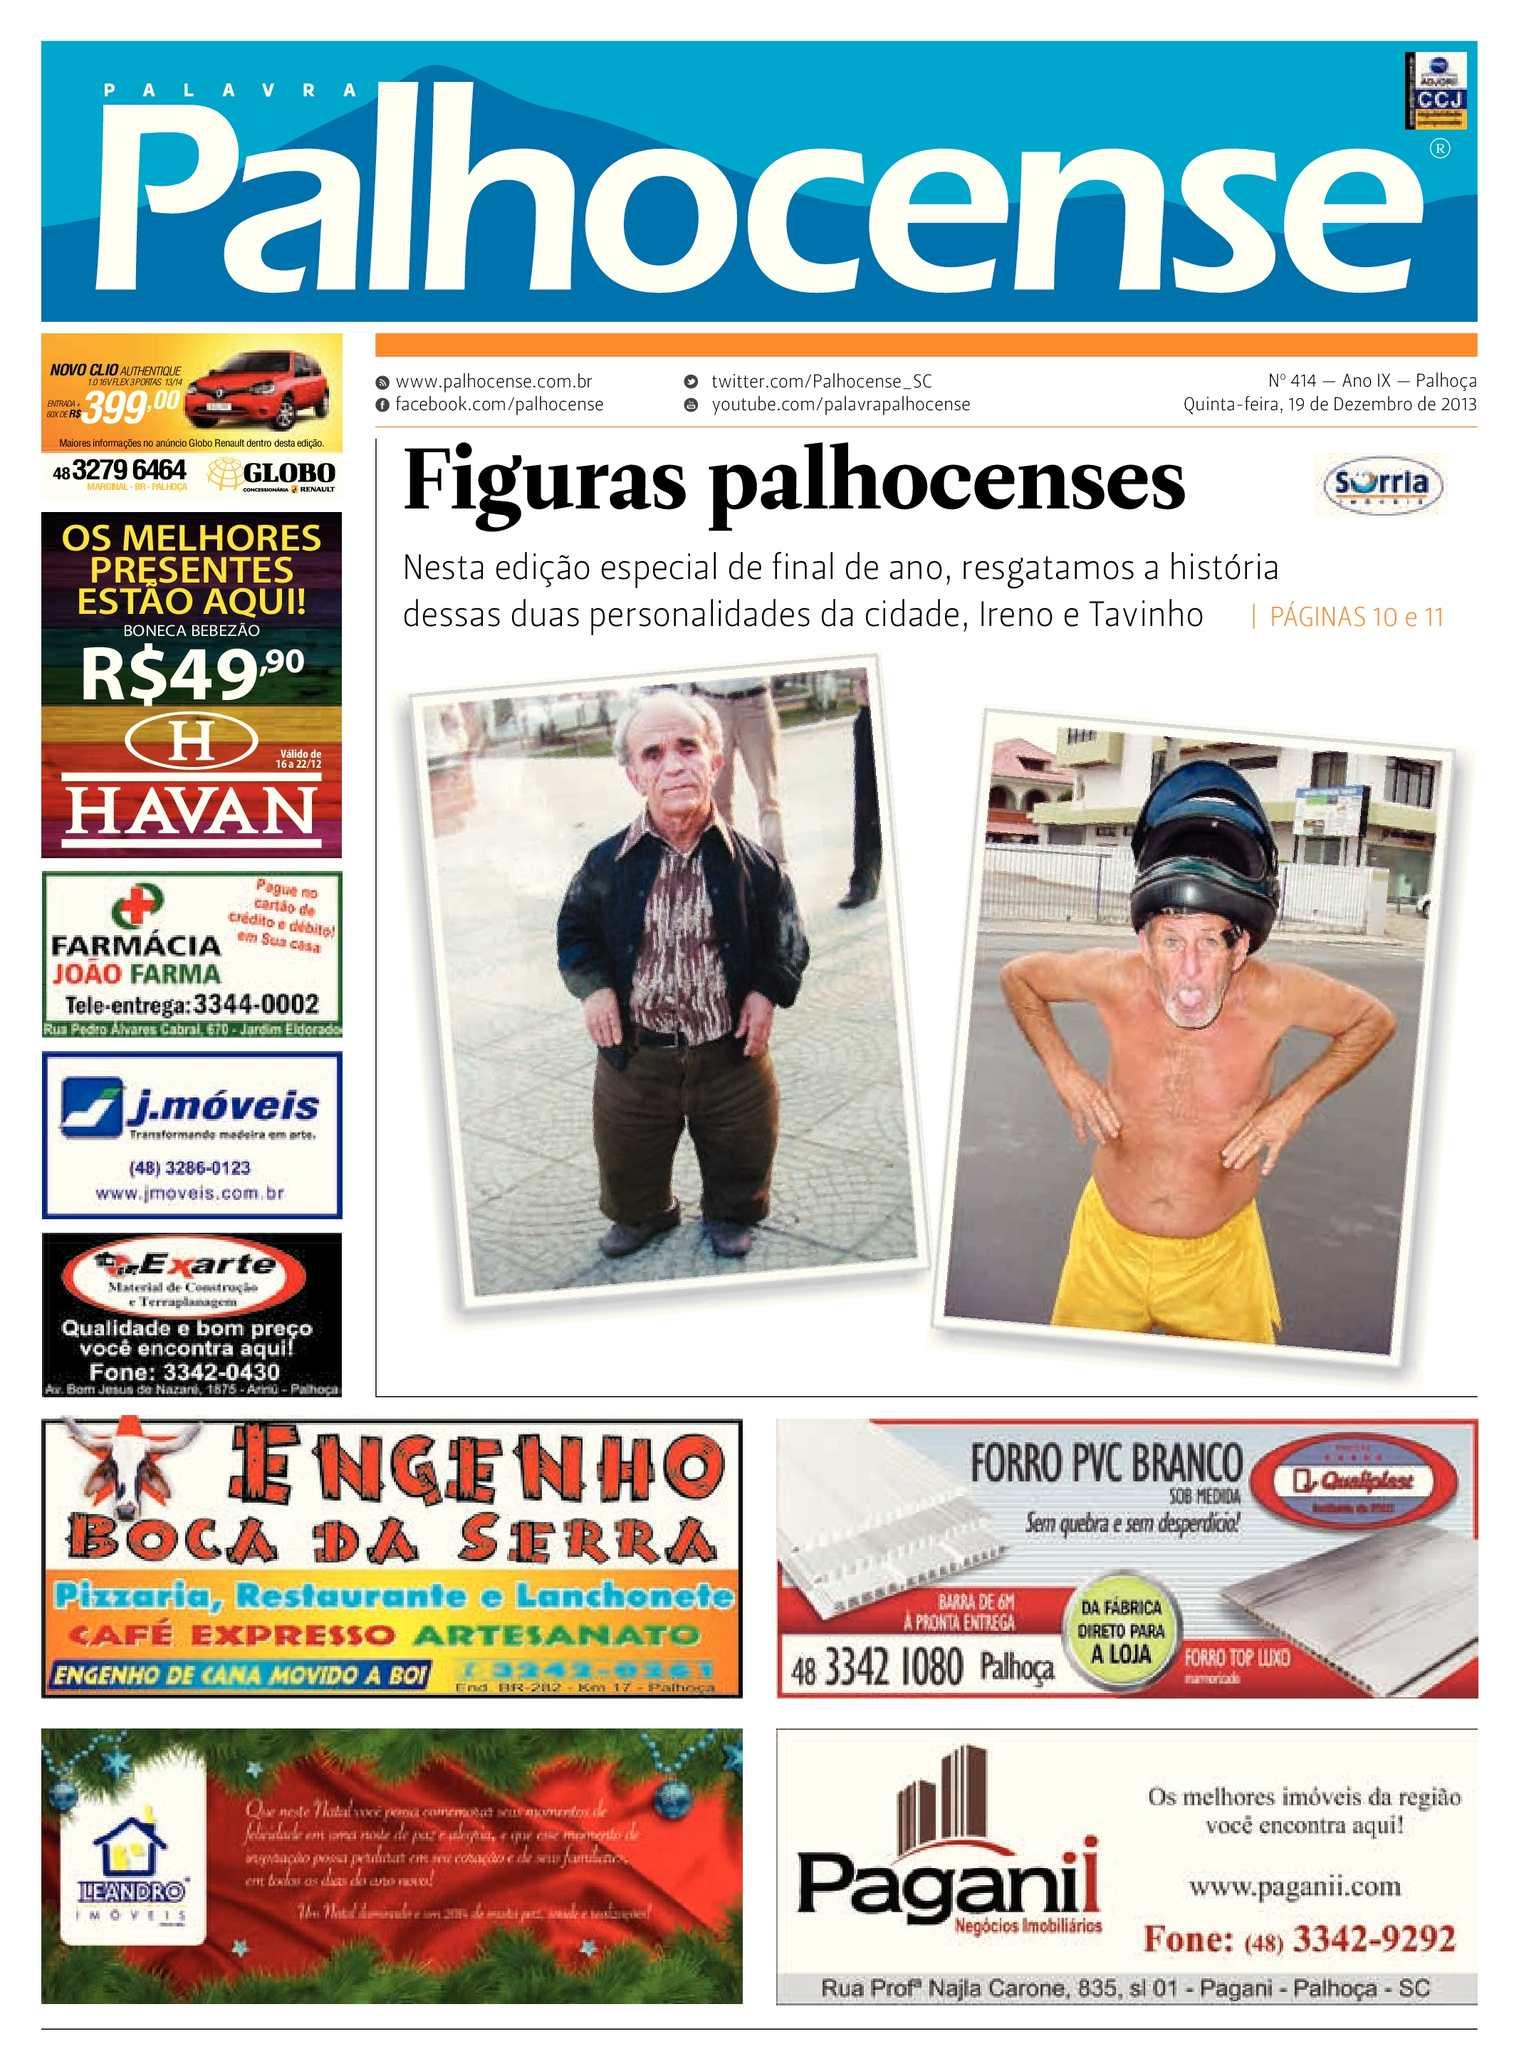 8012f2a817ca6 Calaméo - Jornal Palavra Palhocense - Edição 414